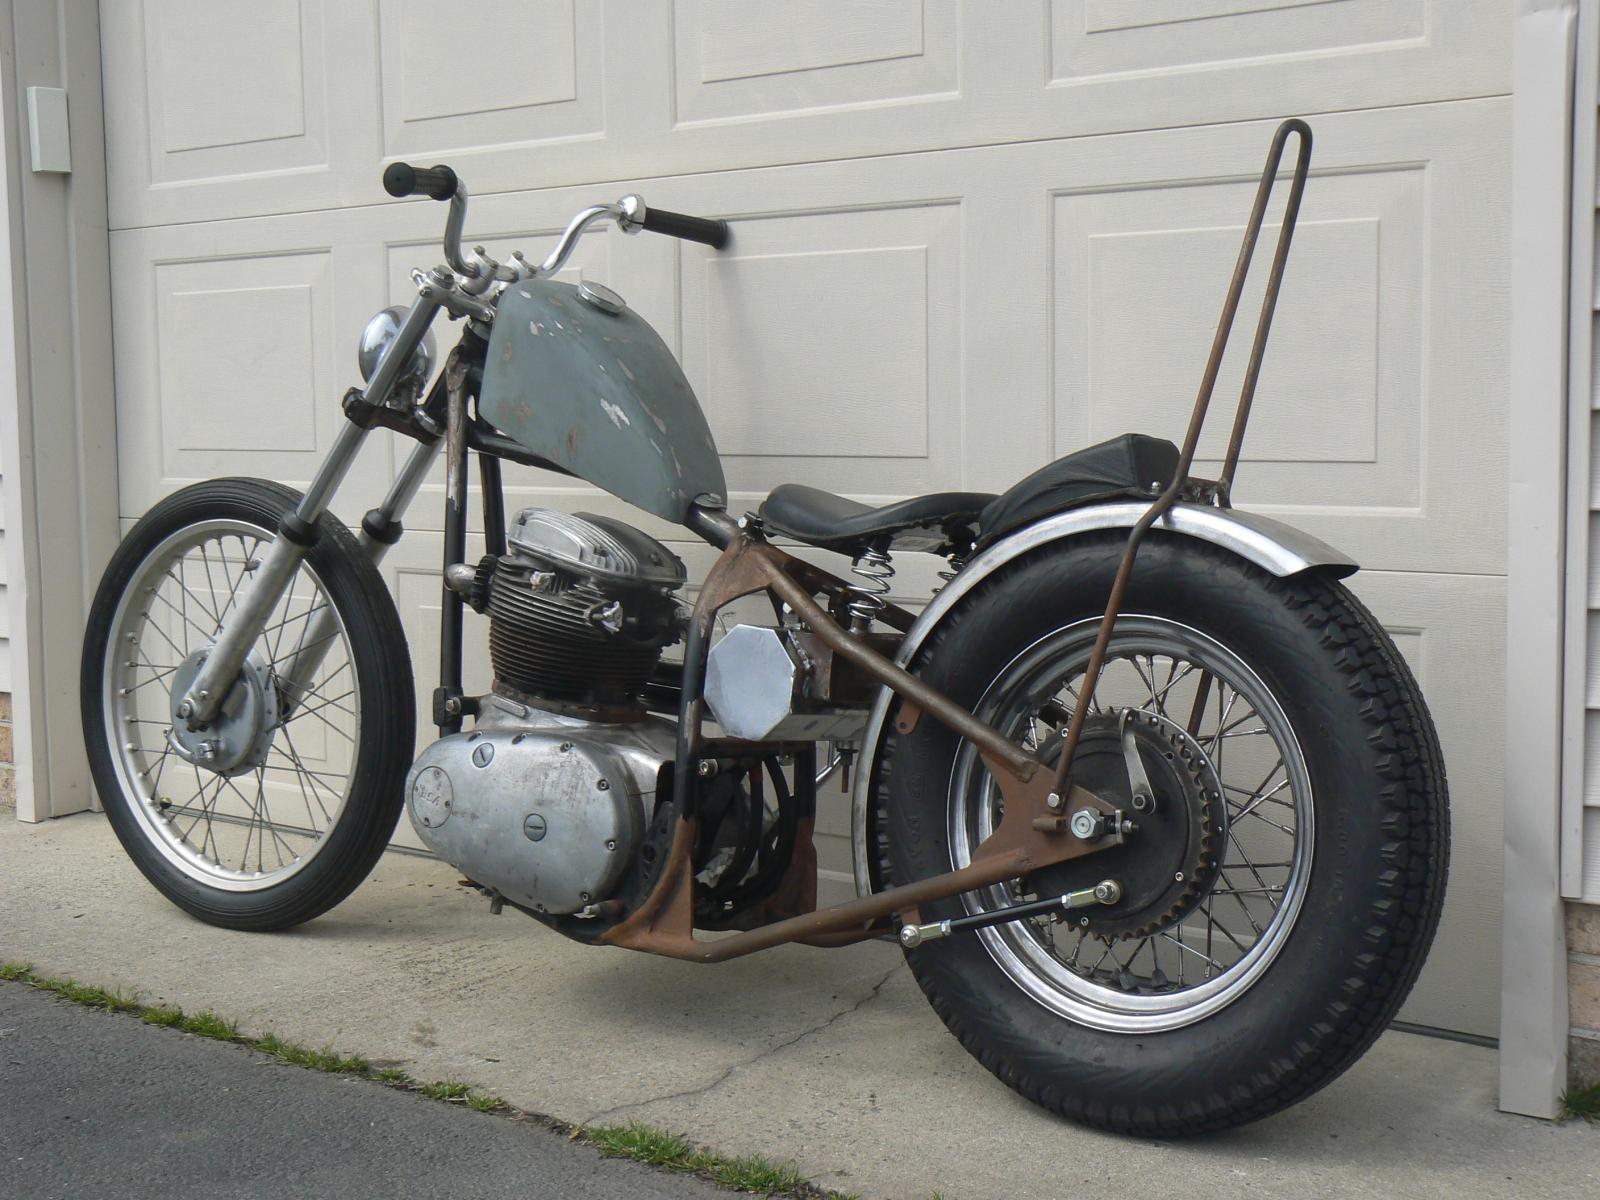 For Sale - - 1969 bsa a65 hardtail | Yamaha XS650 Forum